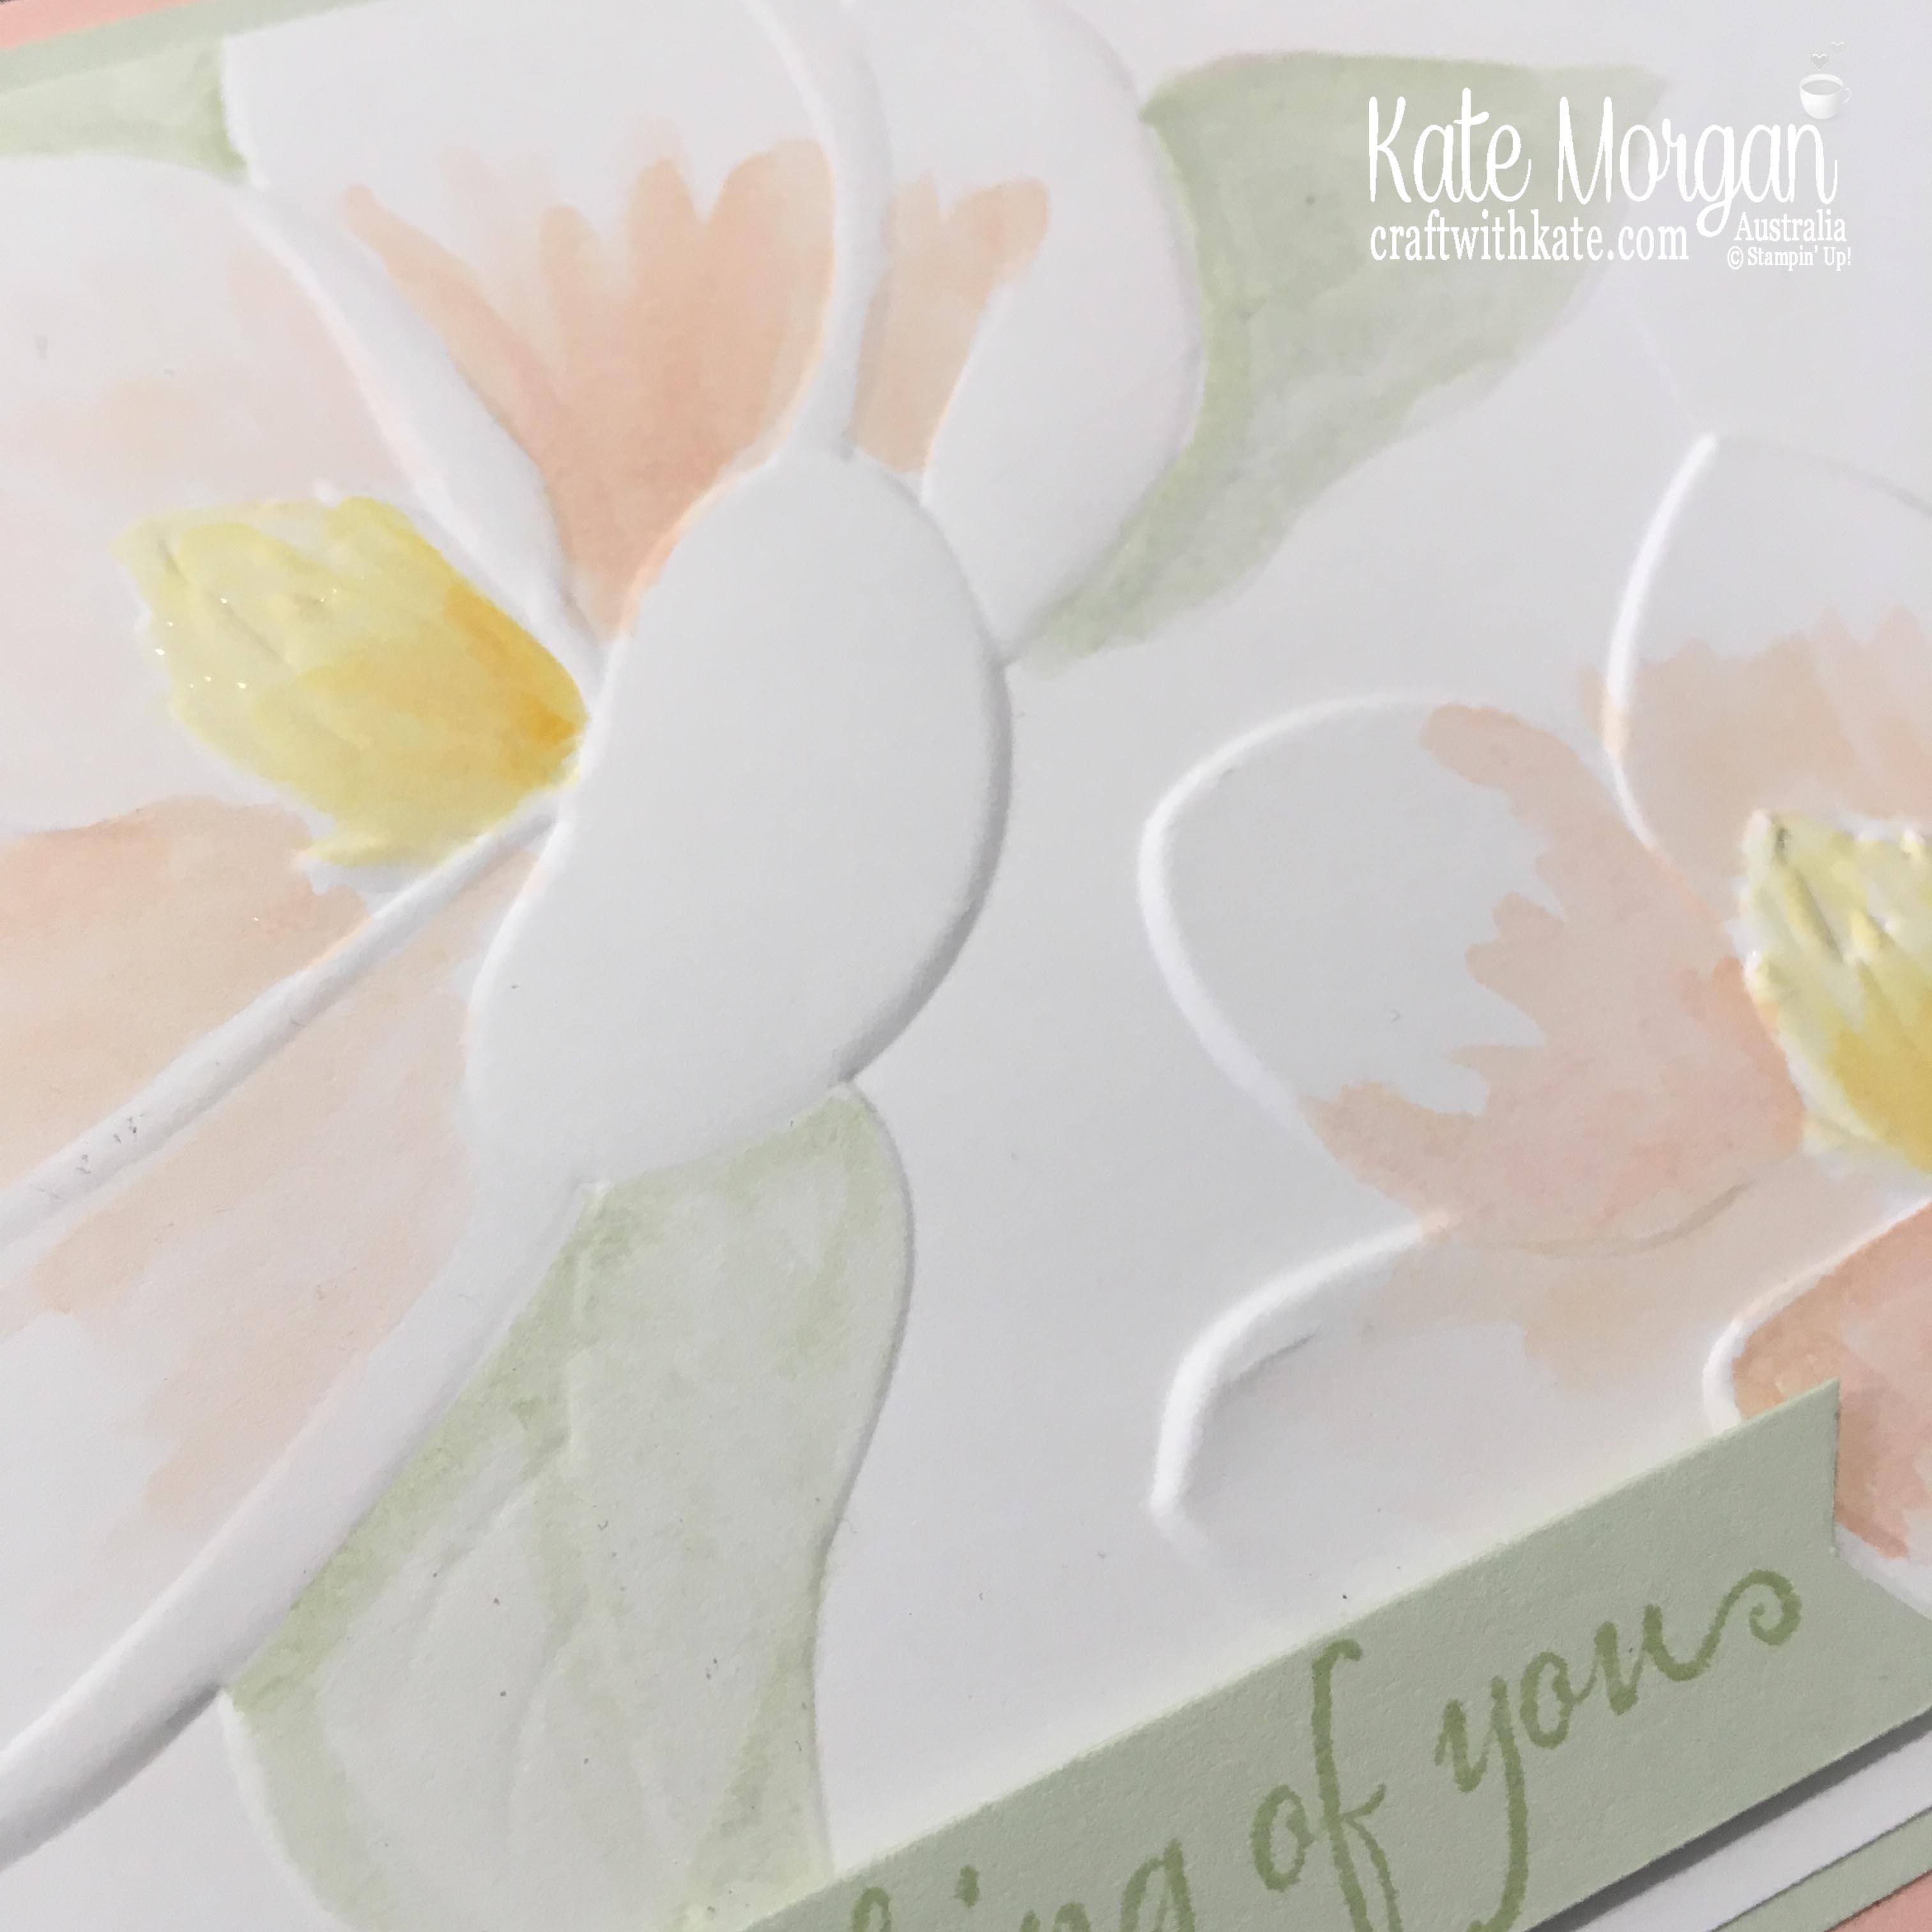 Magnolia Blooms watercolour, Stampin Up by Kate Morgan, Australia 2019.